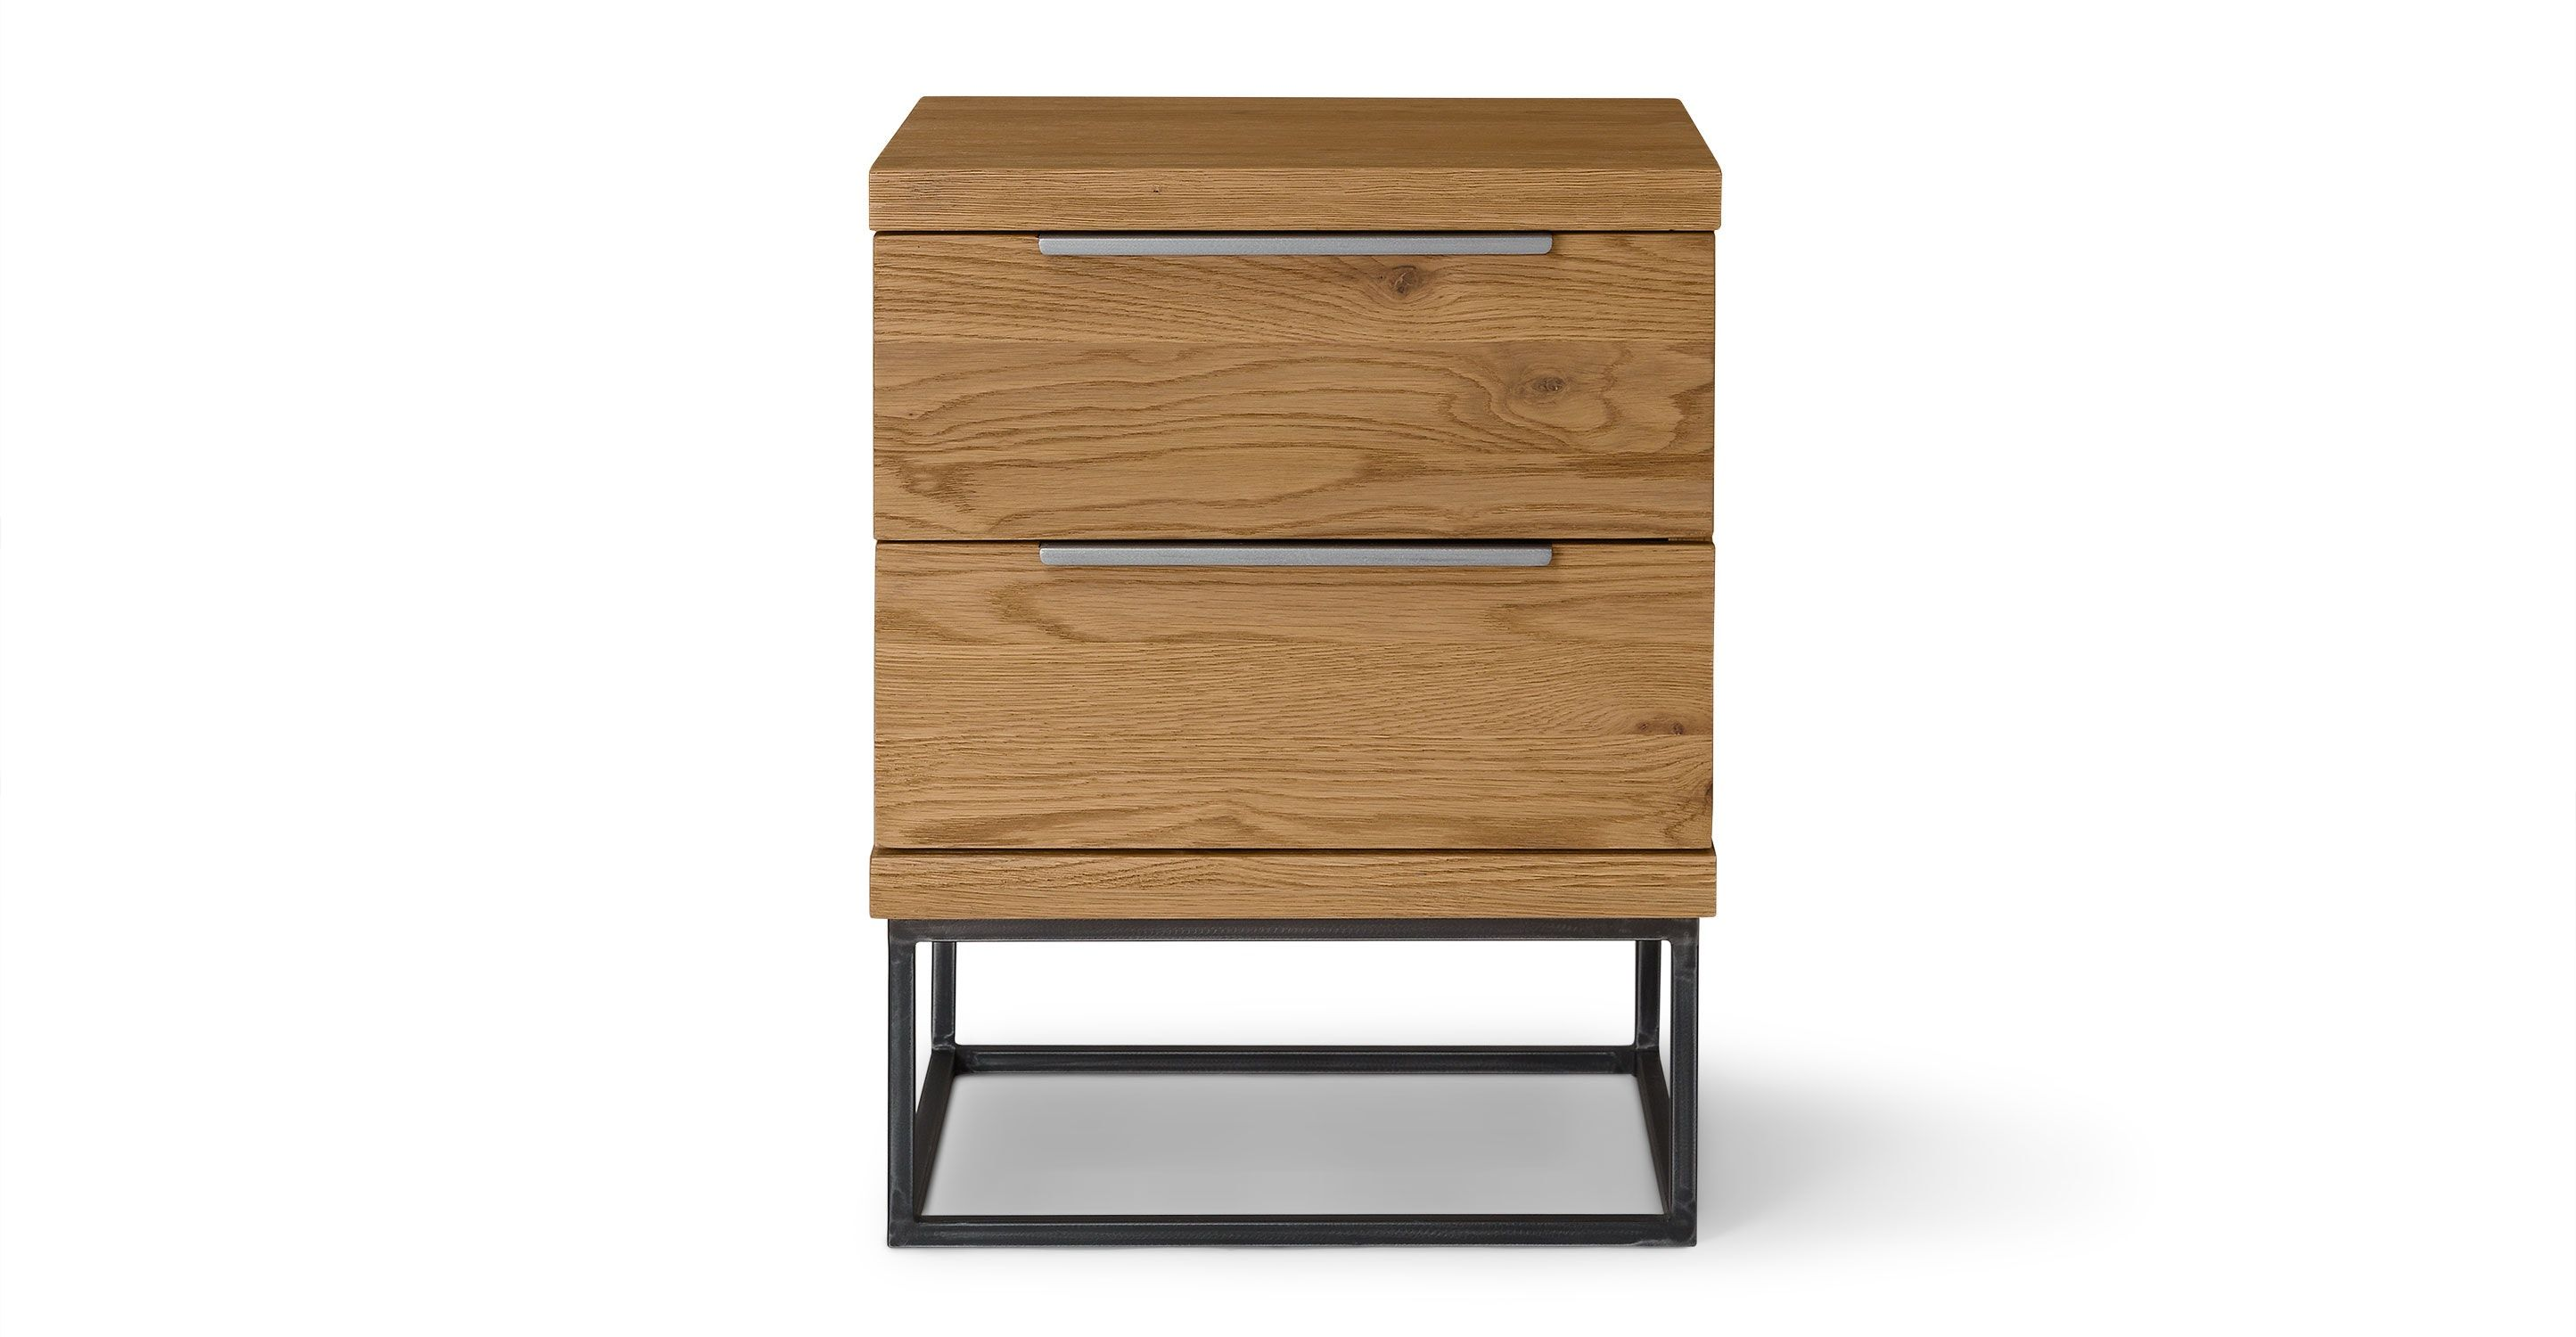 Taiga oak 2 drawer nightstand nightstands article modern mid century and scandinavian furniture